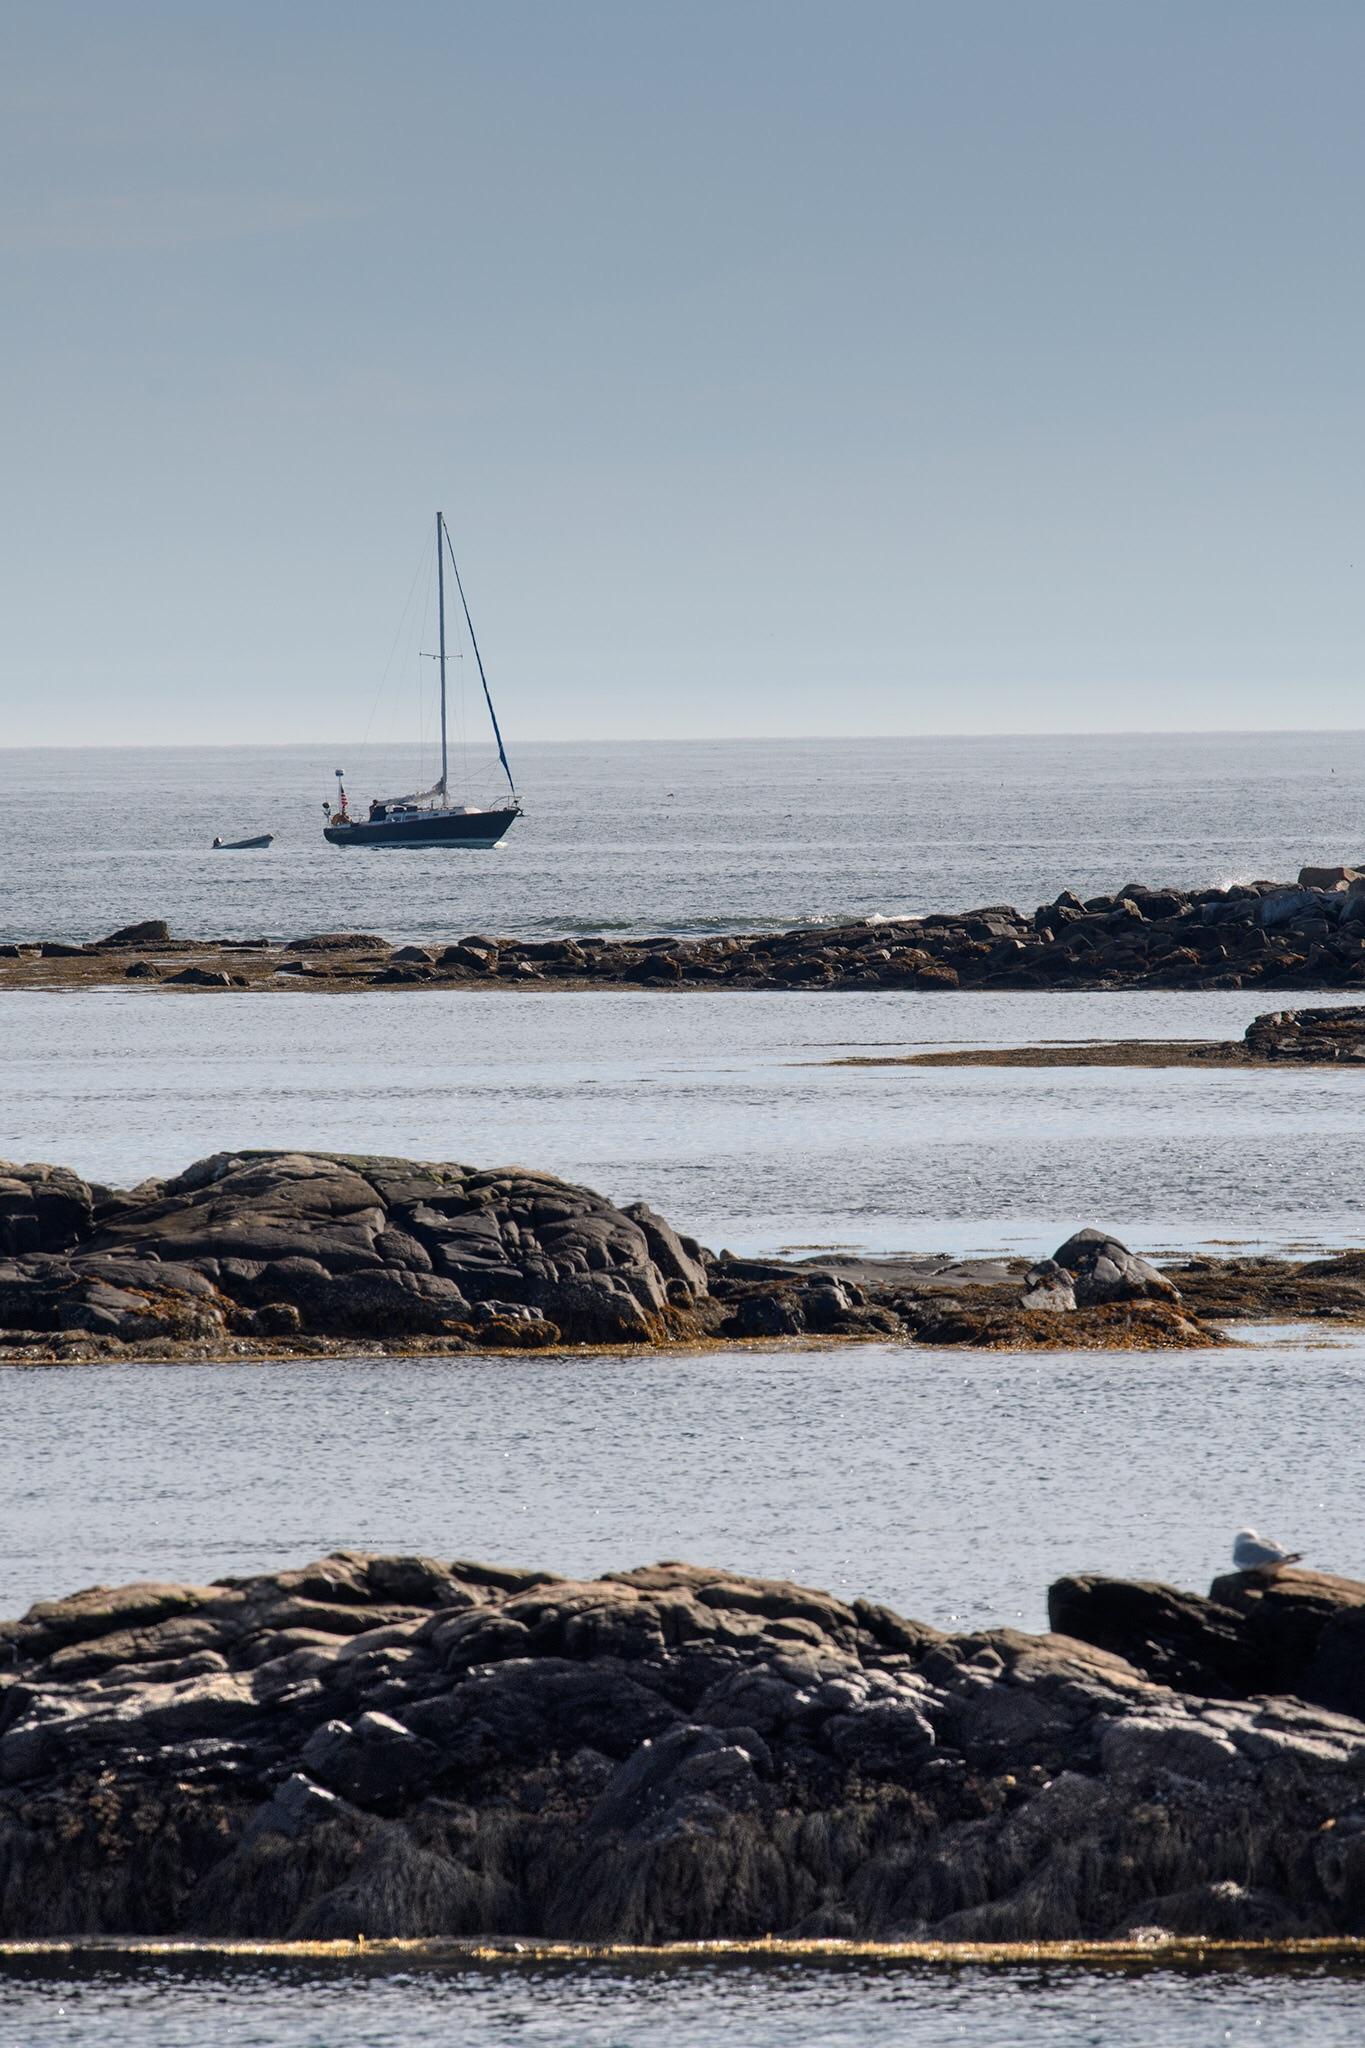 A sailboat moored in Schoodic Harbor